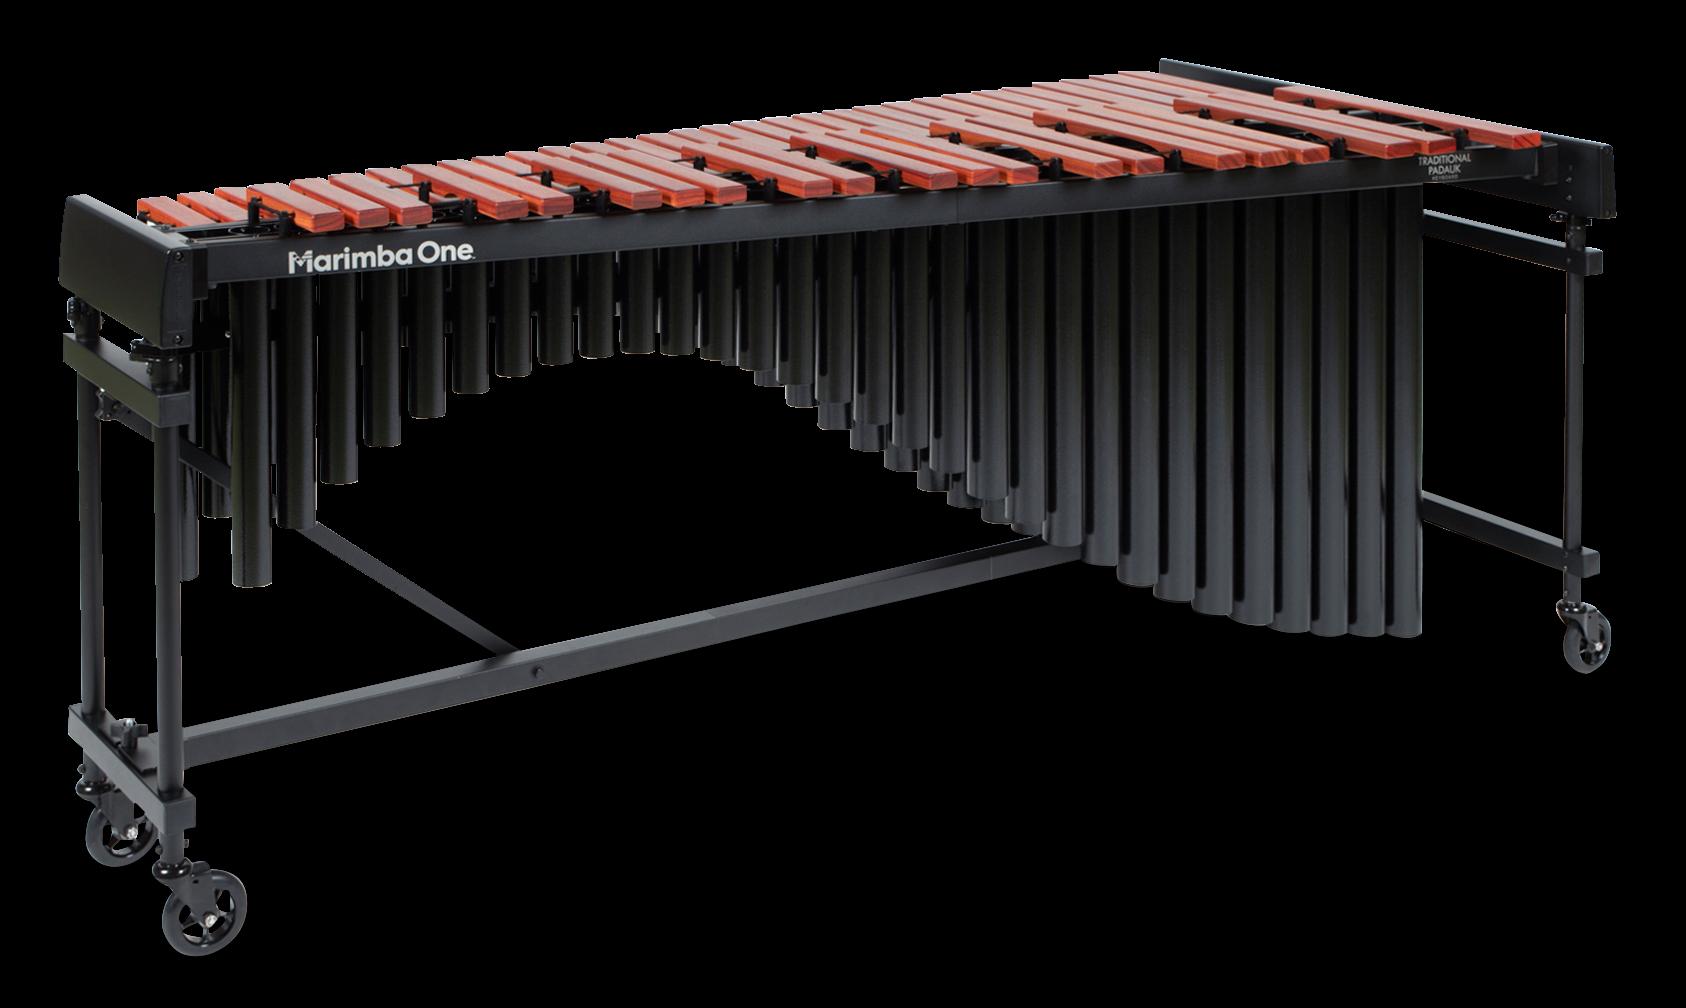 #E8201 Marimba One 4.3 Octave Educational Series Marimba with Classic Resonators, Traditional Padauk Keyboard 4.3個八度、經典共鳴管、傳統琴鍵、紫檀木